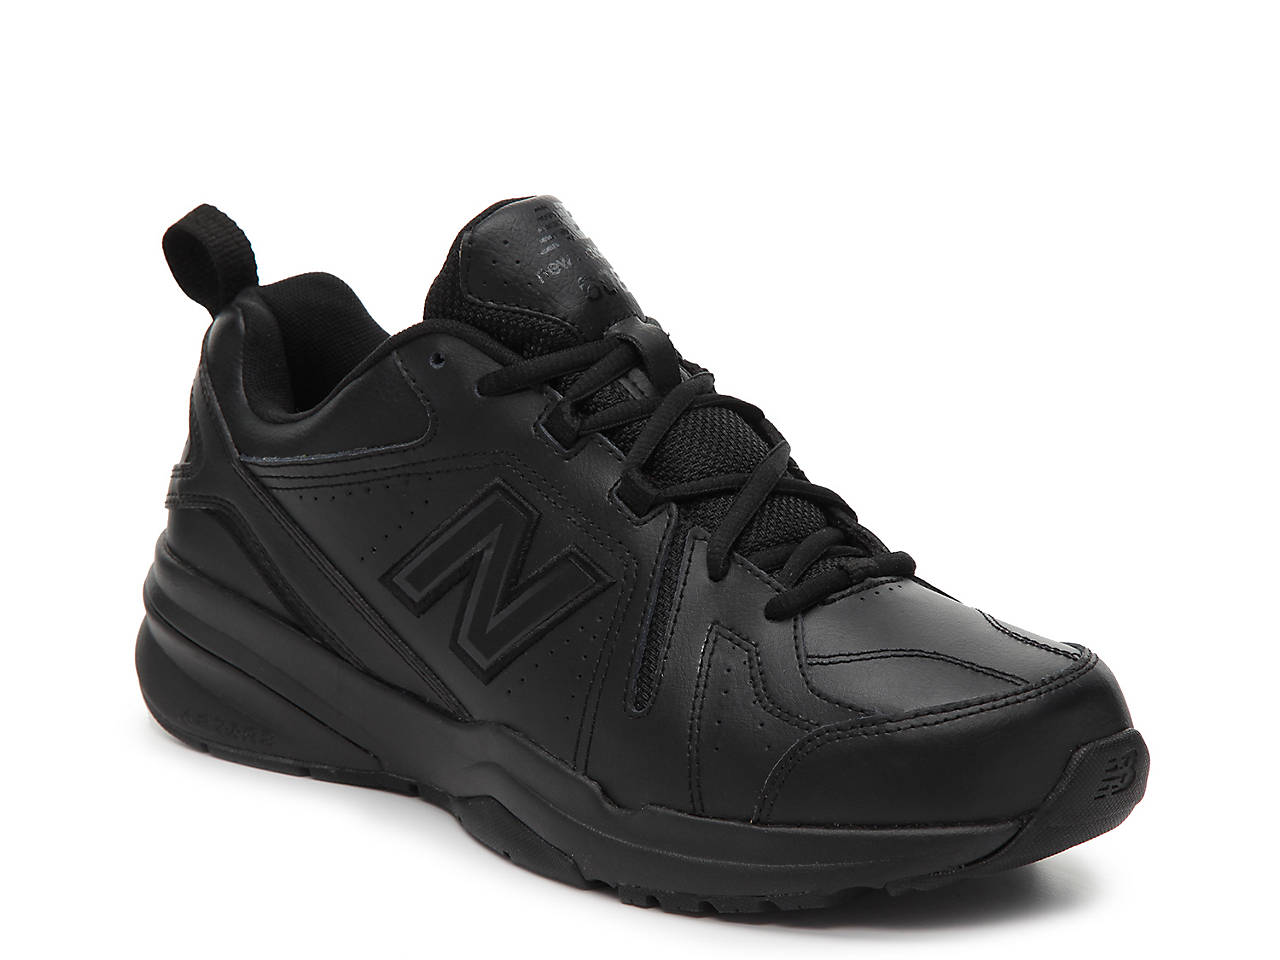 8301adc0670 608 V5 Training Shoe - Men's